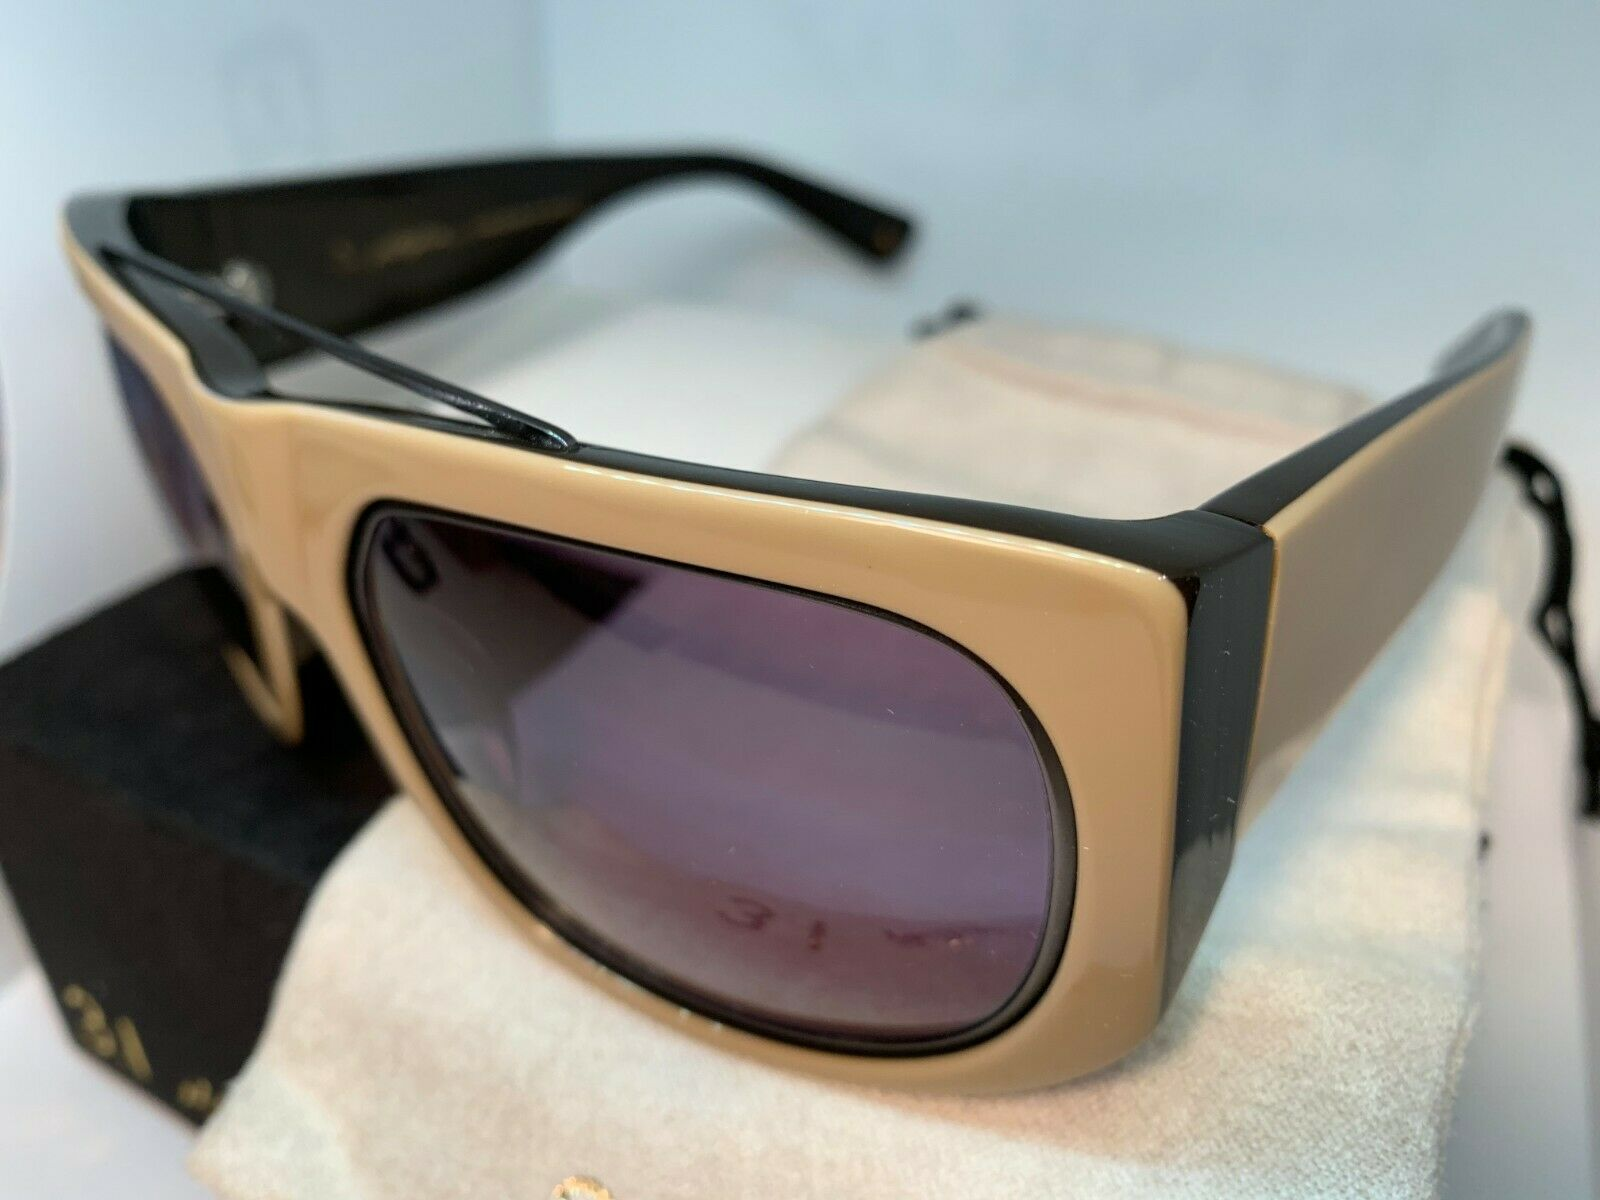 3.1 Phillip Lim Sunglasses RYDER TANBK Tan Black 59-21-135 New in case